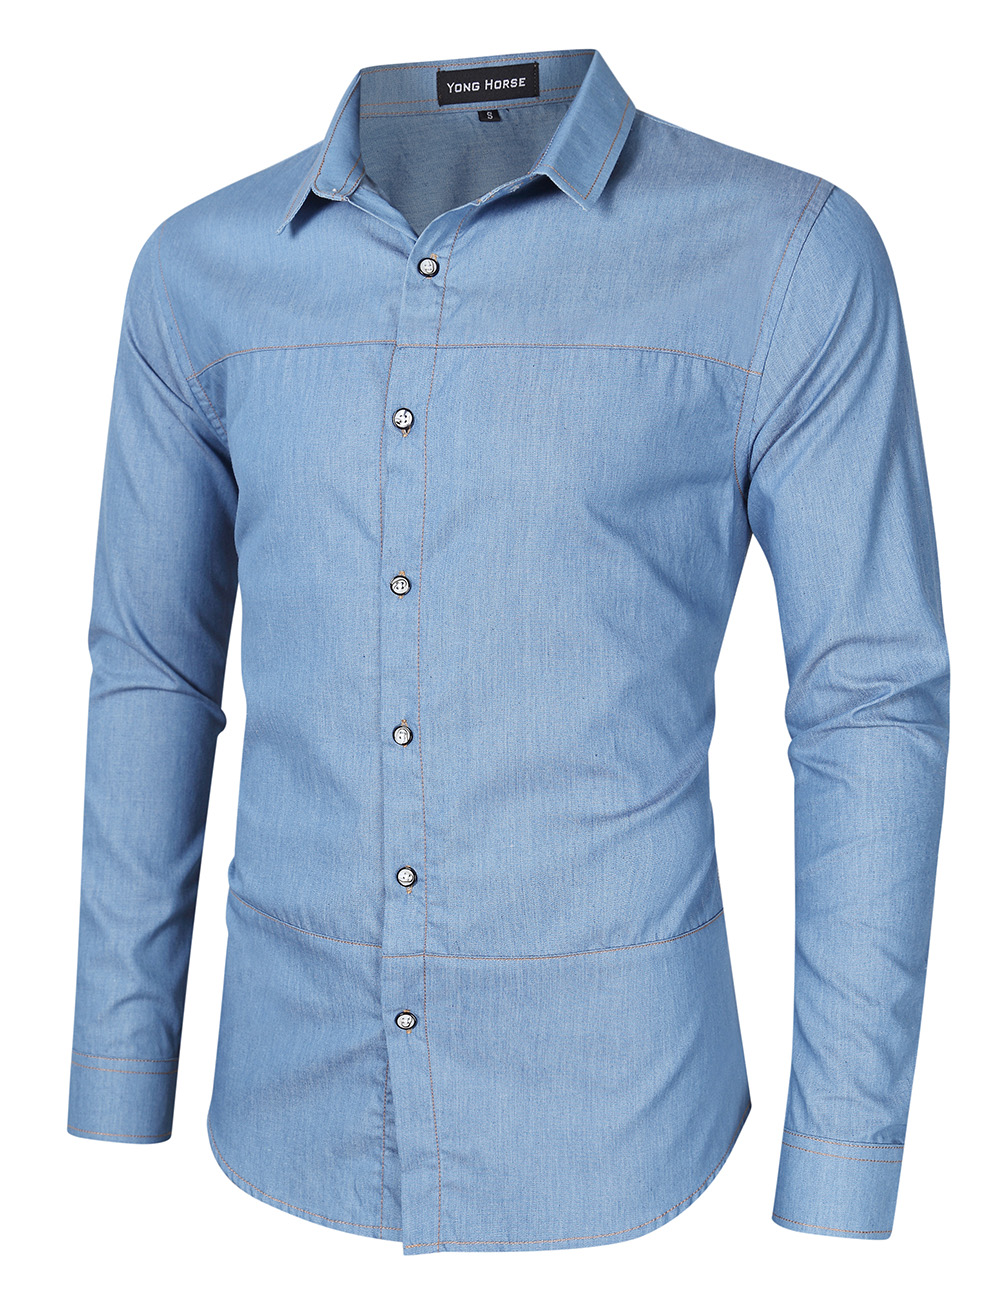 [US Direct] Yong Horse Men's Casual Slim Fit Button Down Long Sleeve Denim Shirt Light blue_L